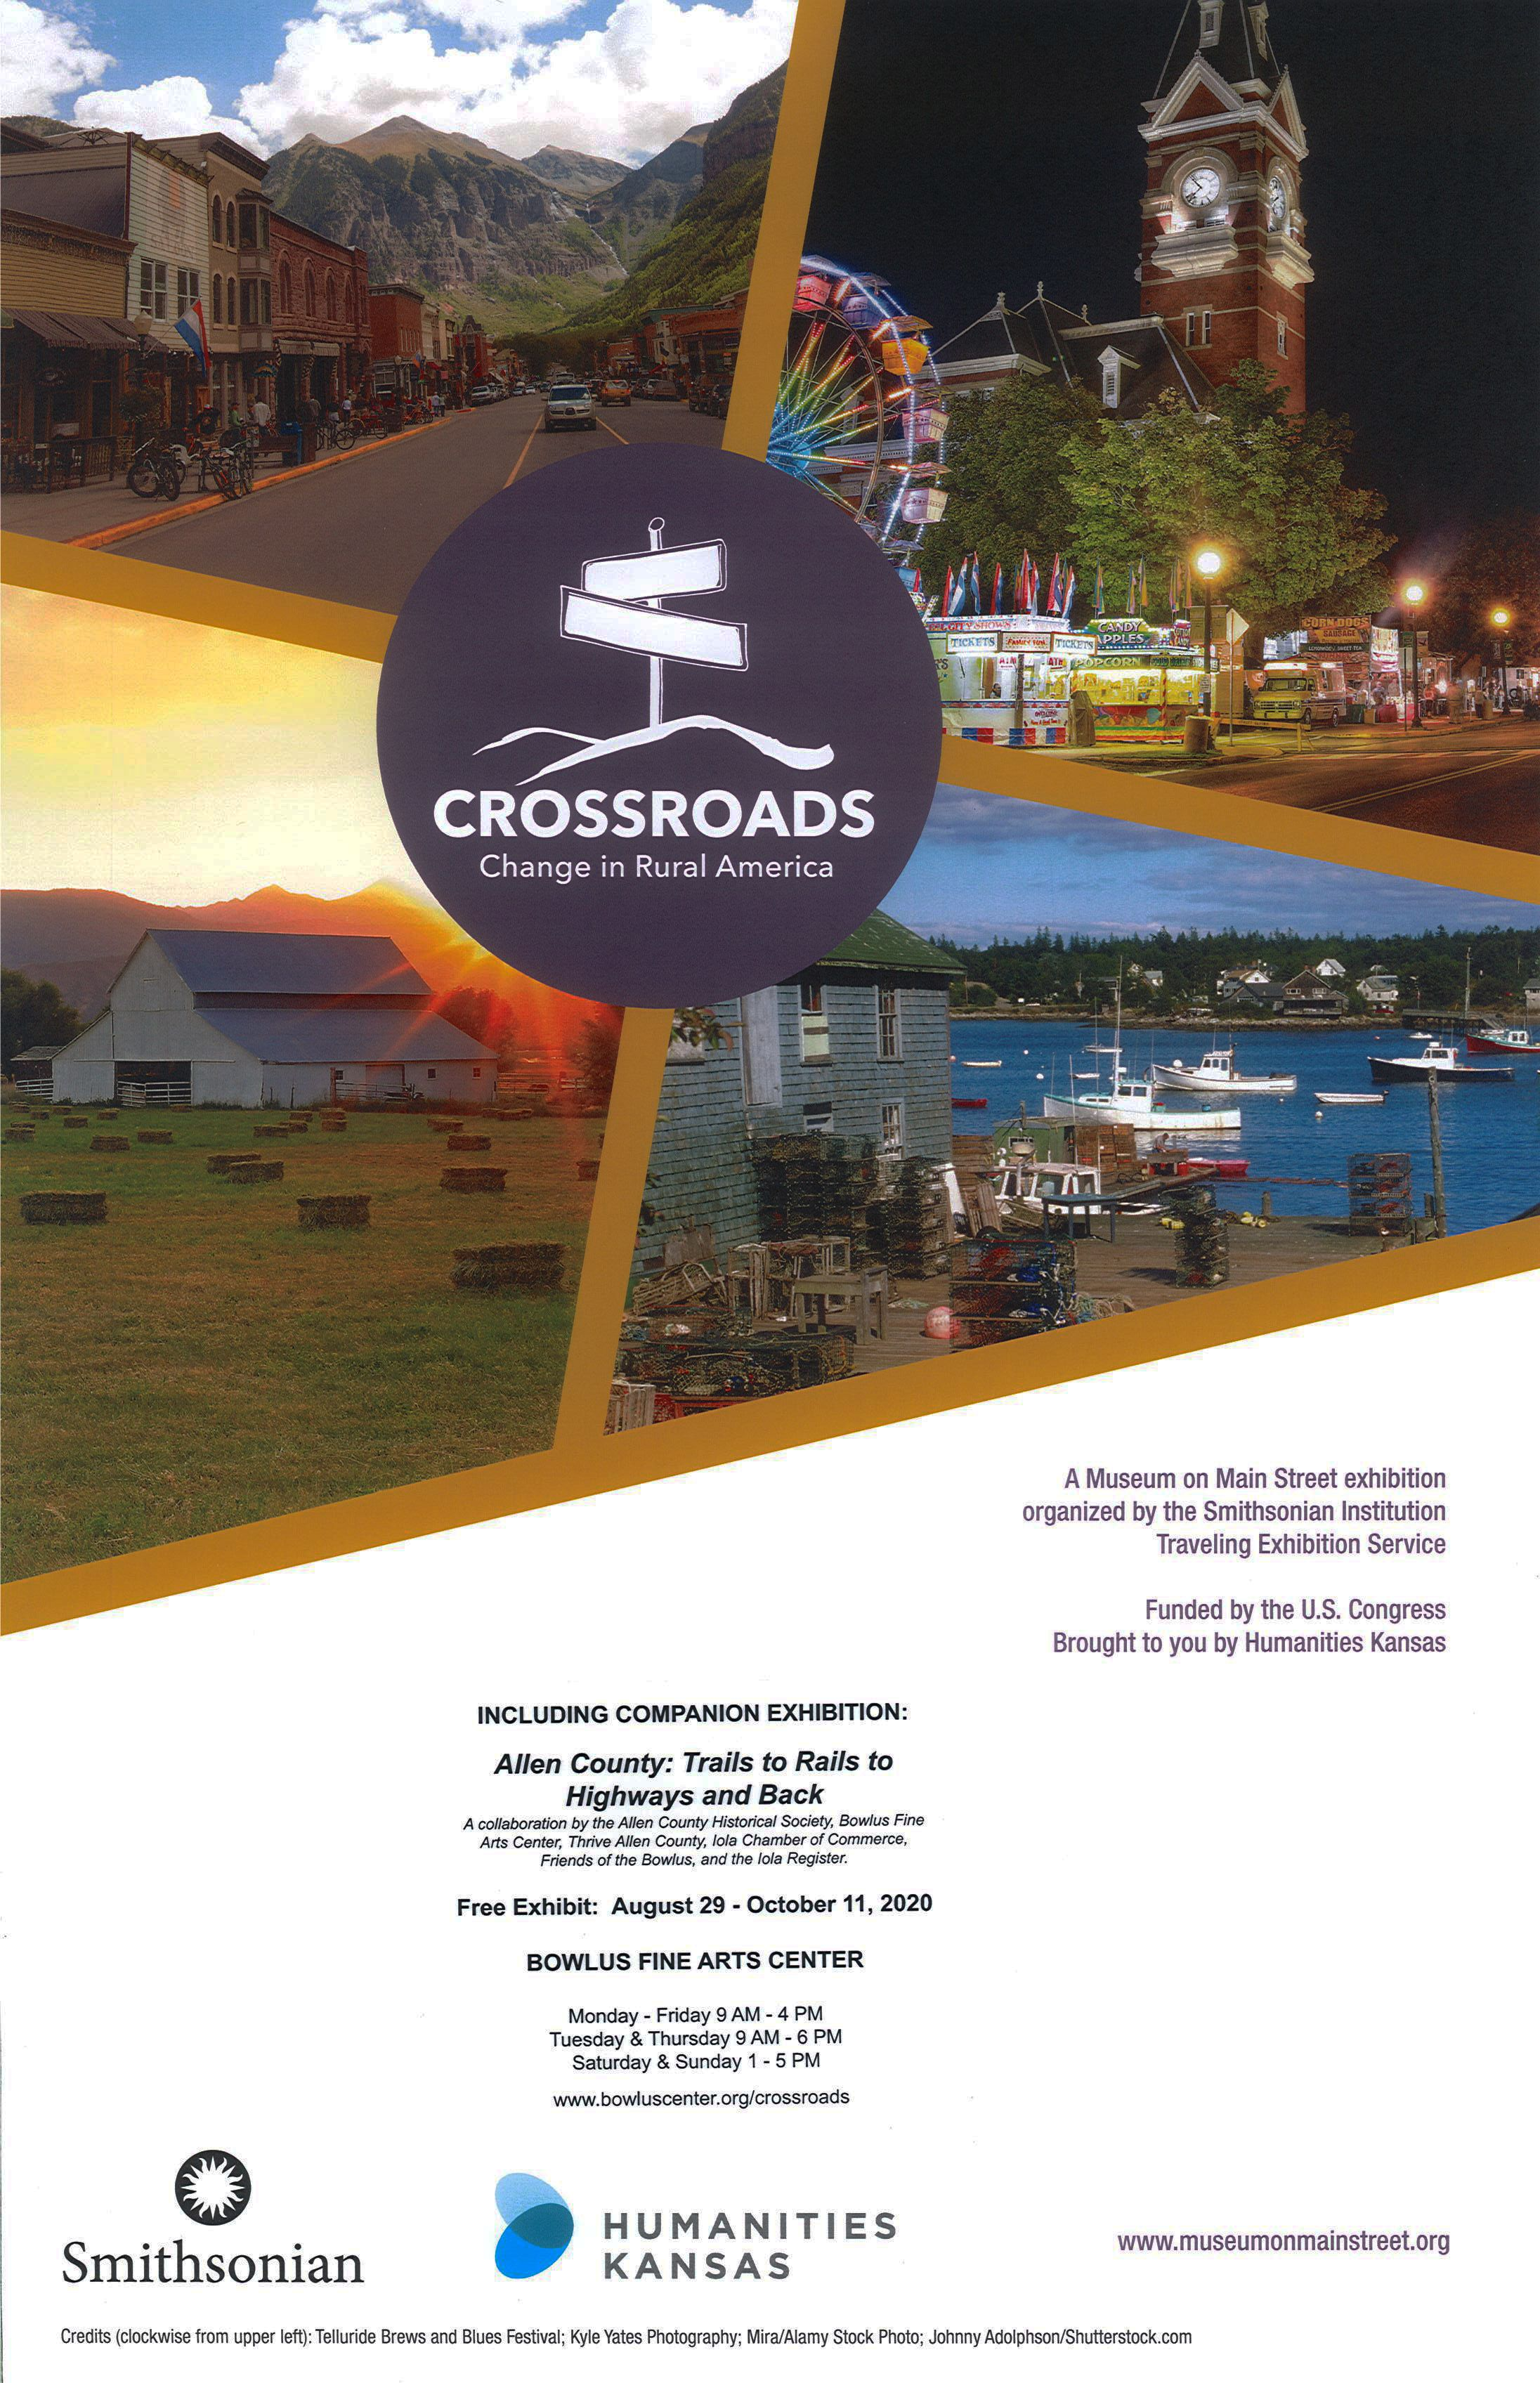 Smithsonian Crossroads: Change in Rural America Exhibit